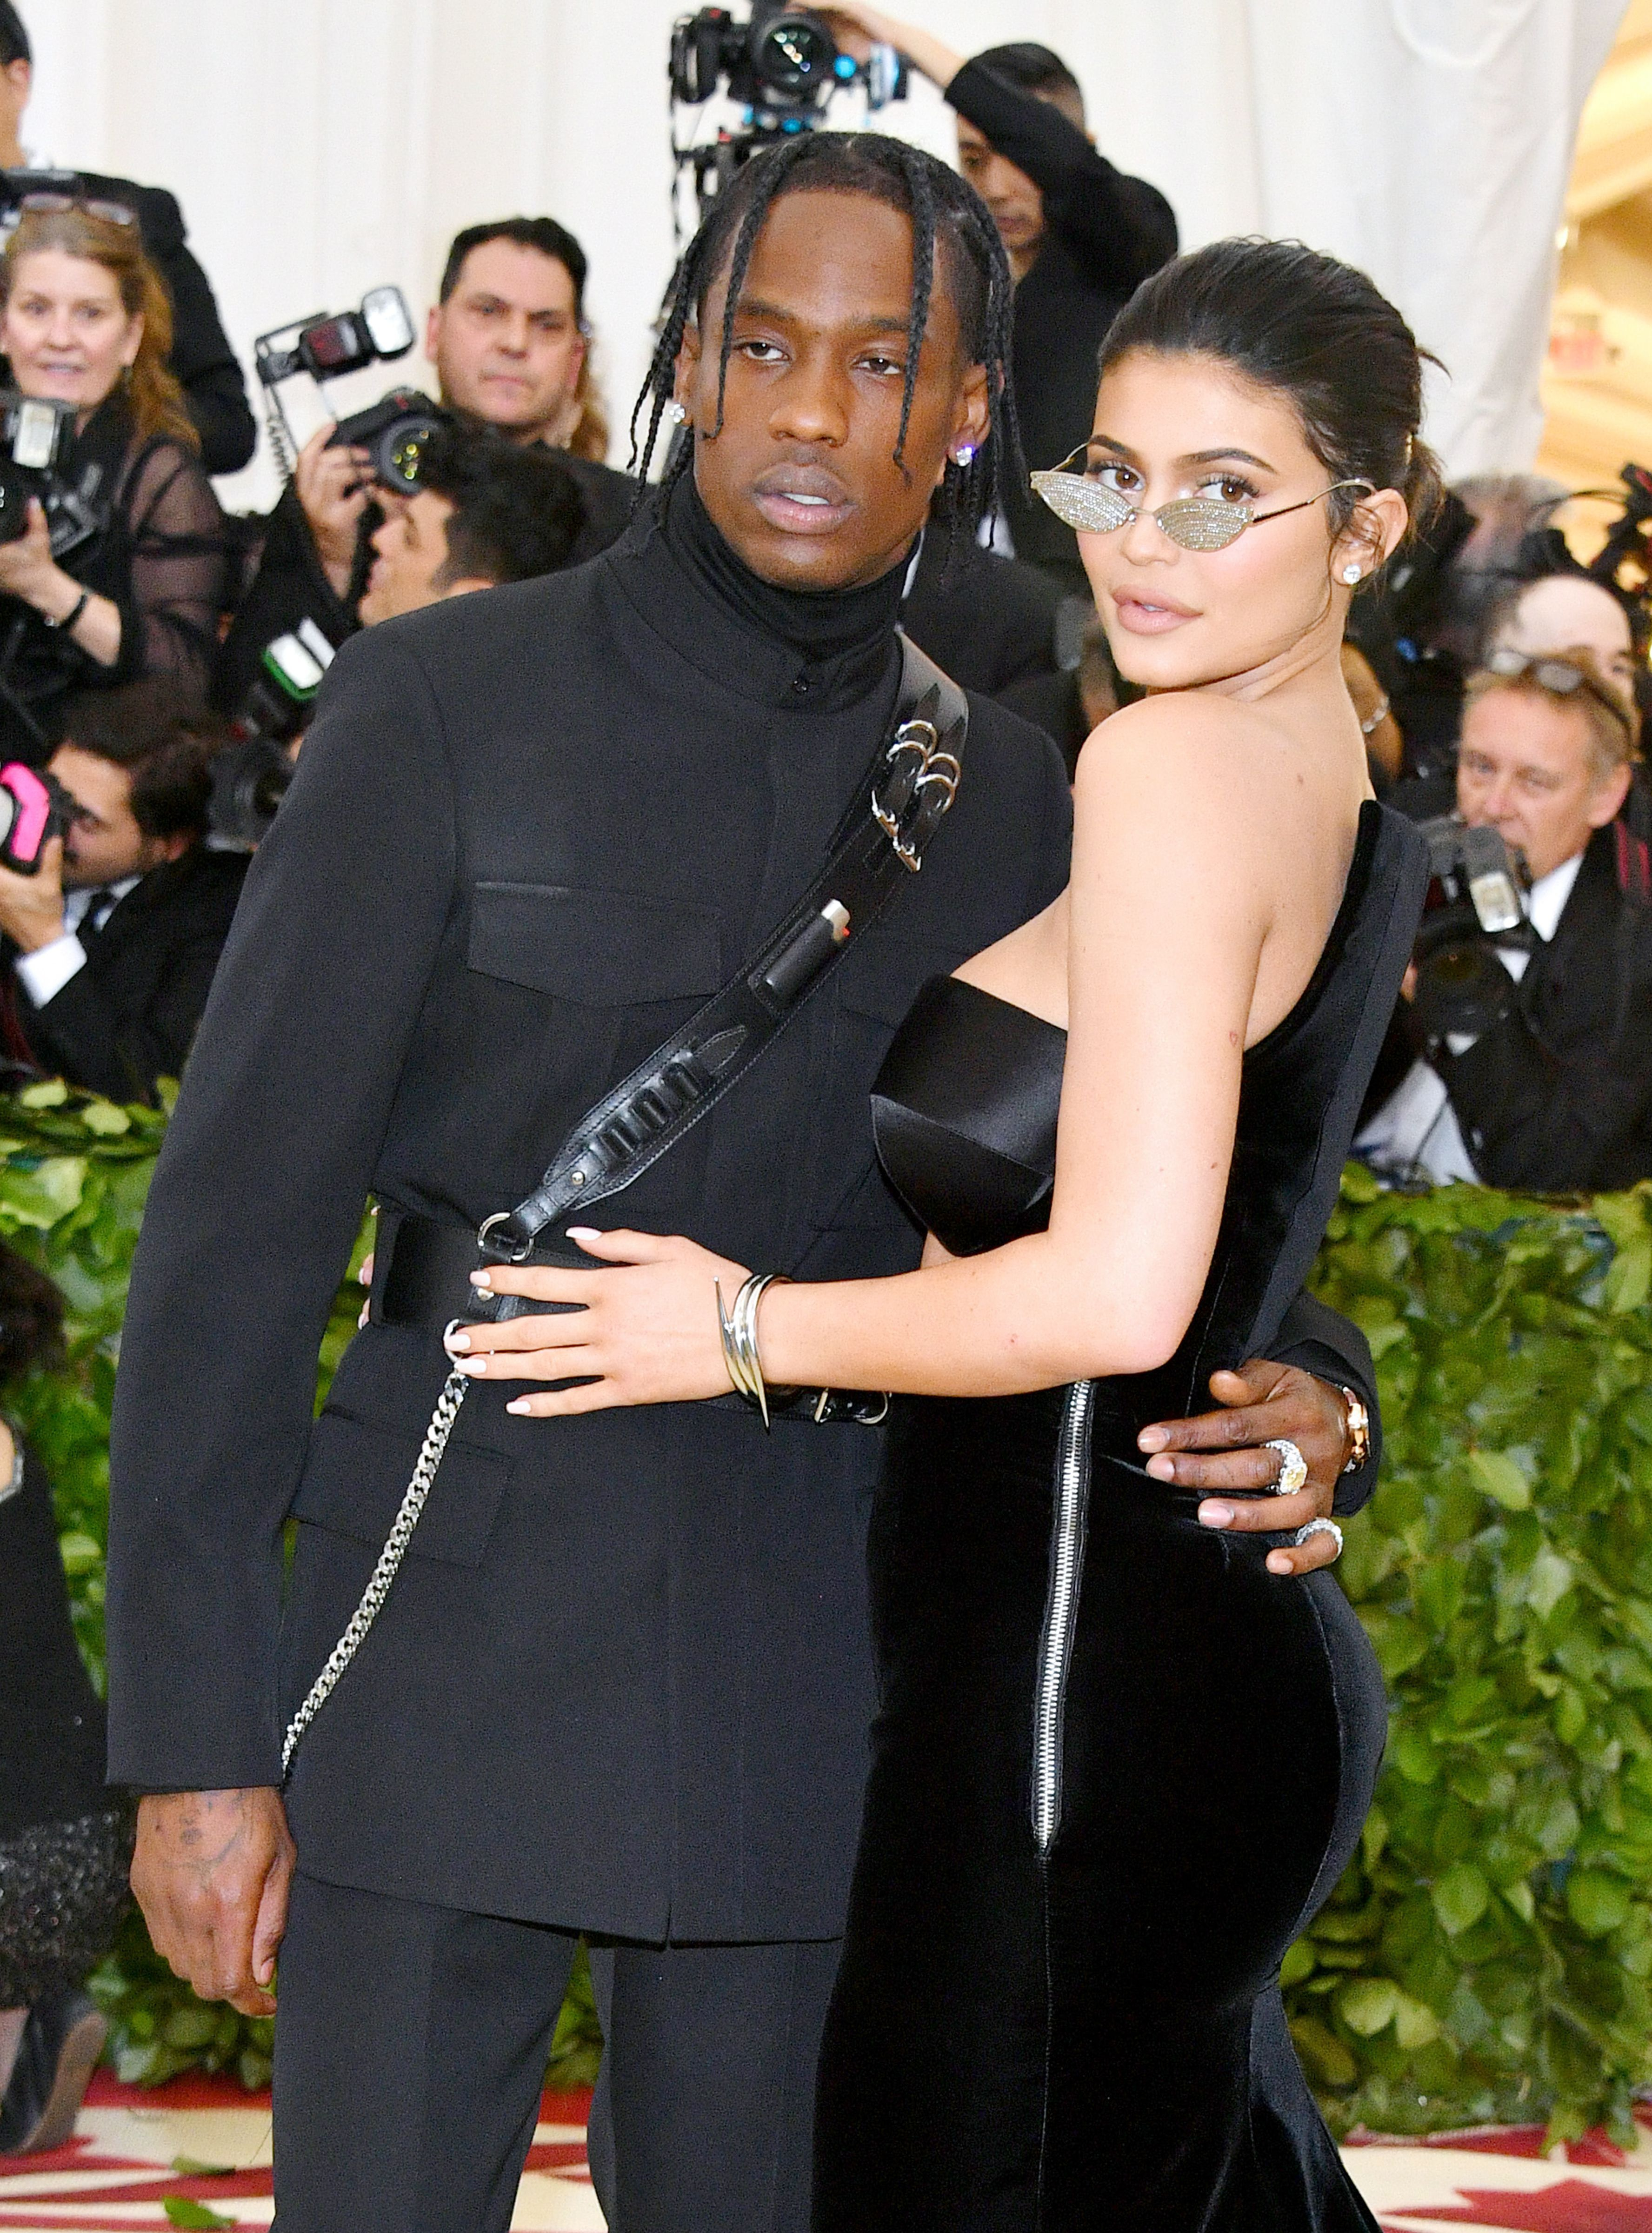 Kylie Jenner Travis Scott Make Matching Red Carpet Debut At Met Gala Refinery29 Kylie Jenner Travis Scott Kylie Travis